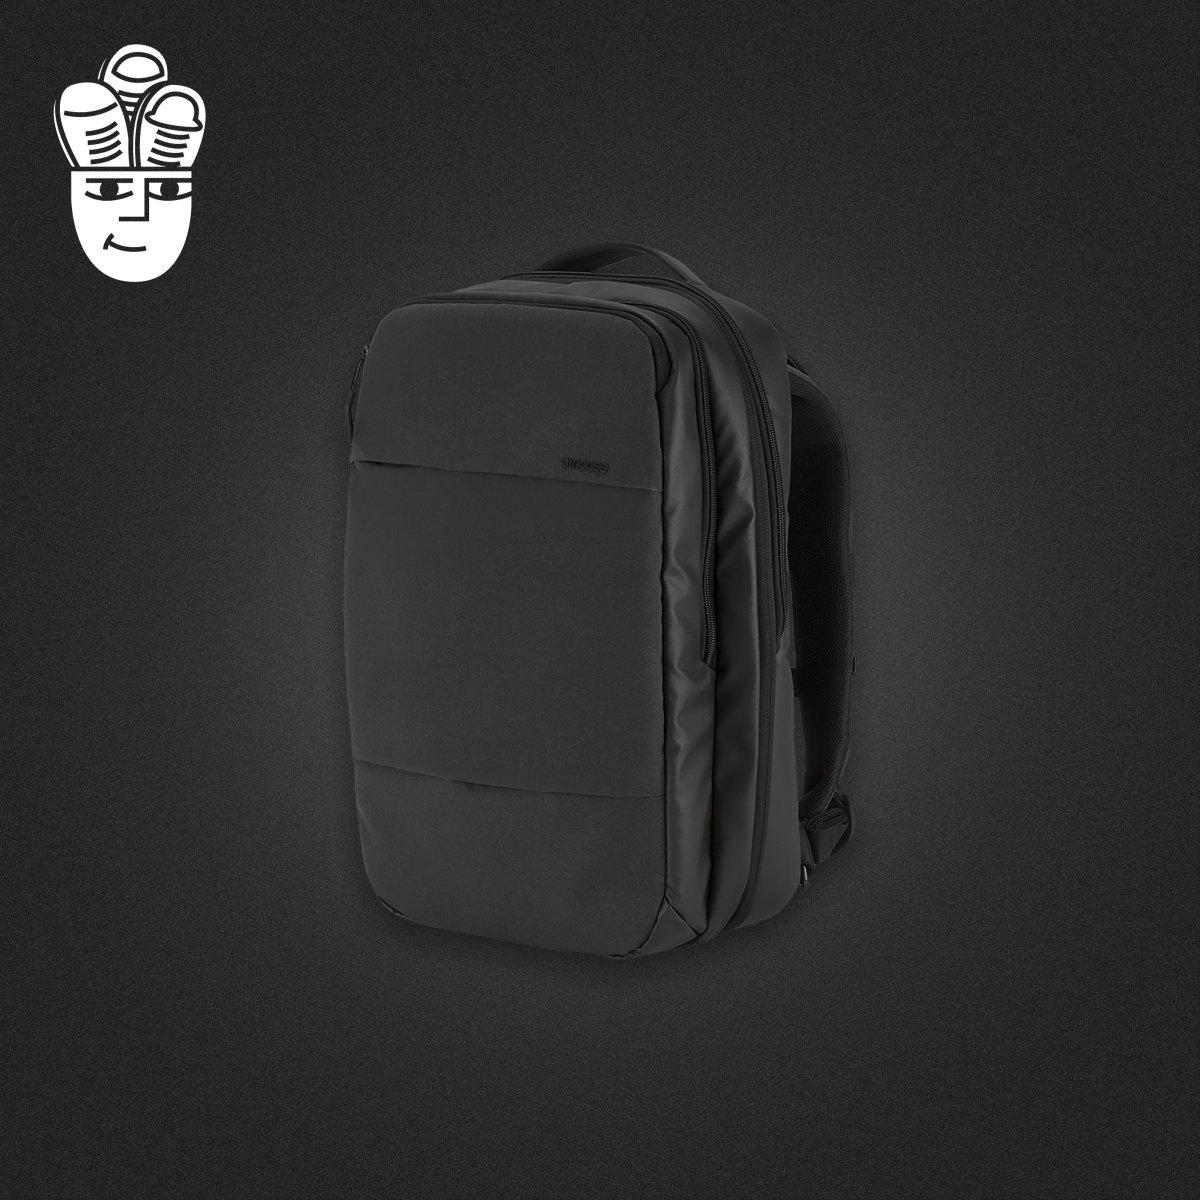 Incase City Commuter Backpack 美国潮流 休闲双肩背包 电脑包